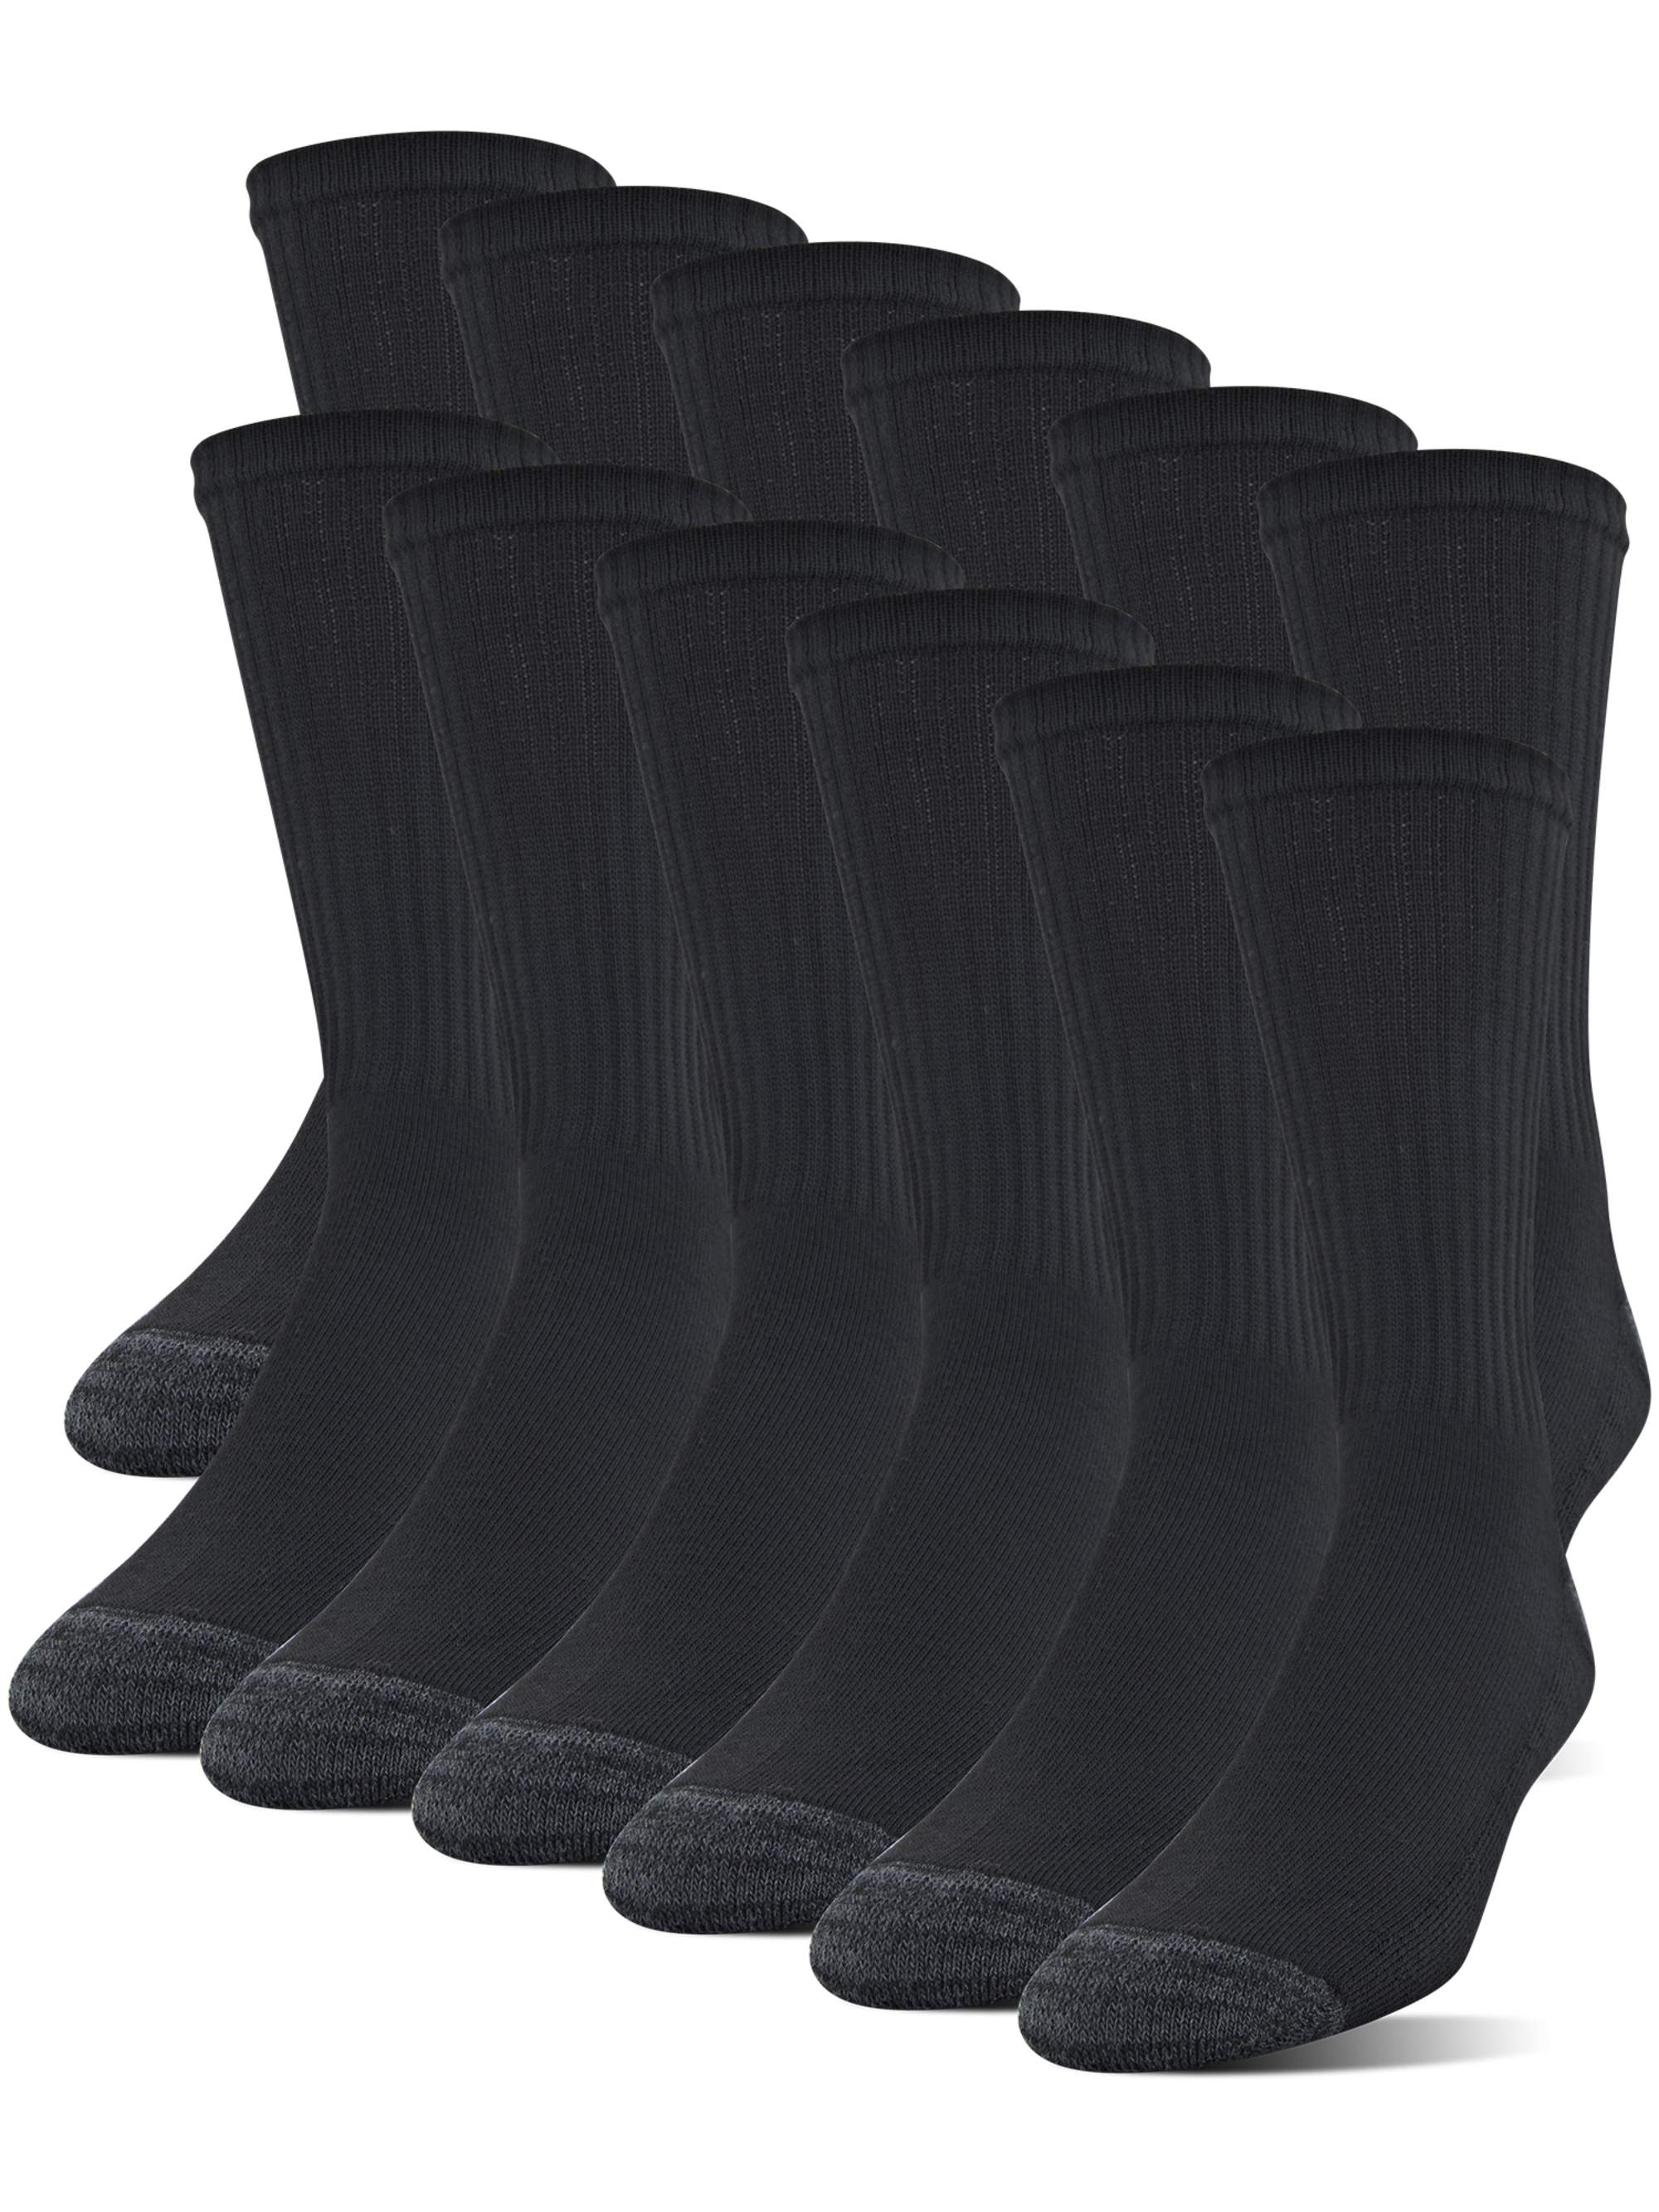 Men's Half Cushion Crew Socks, 12-Pack